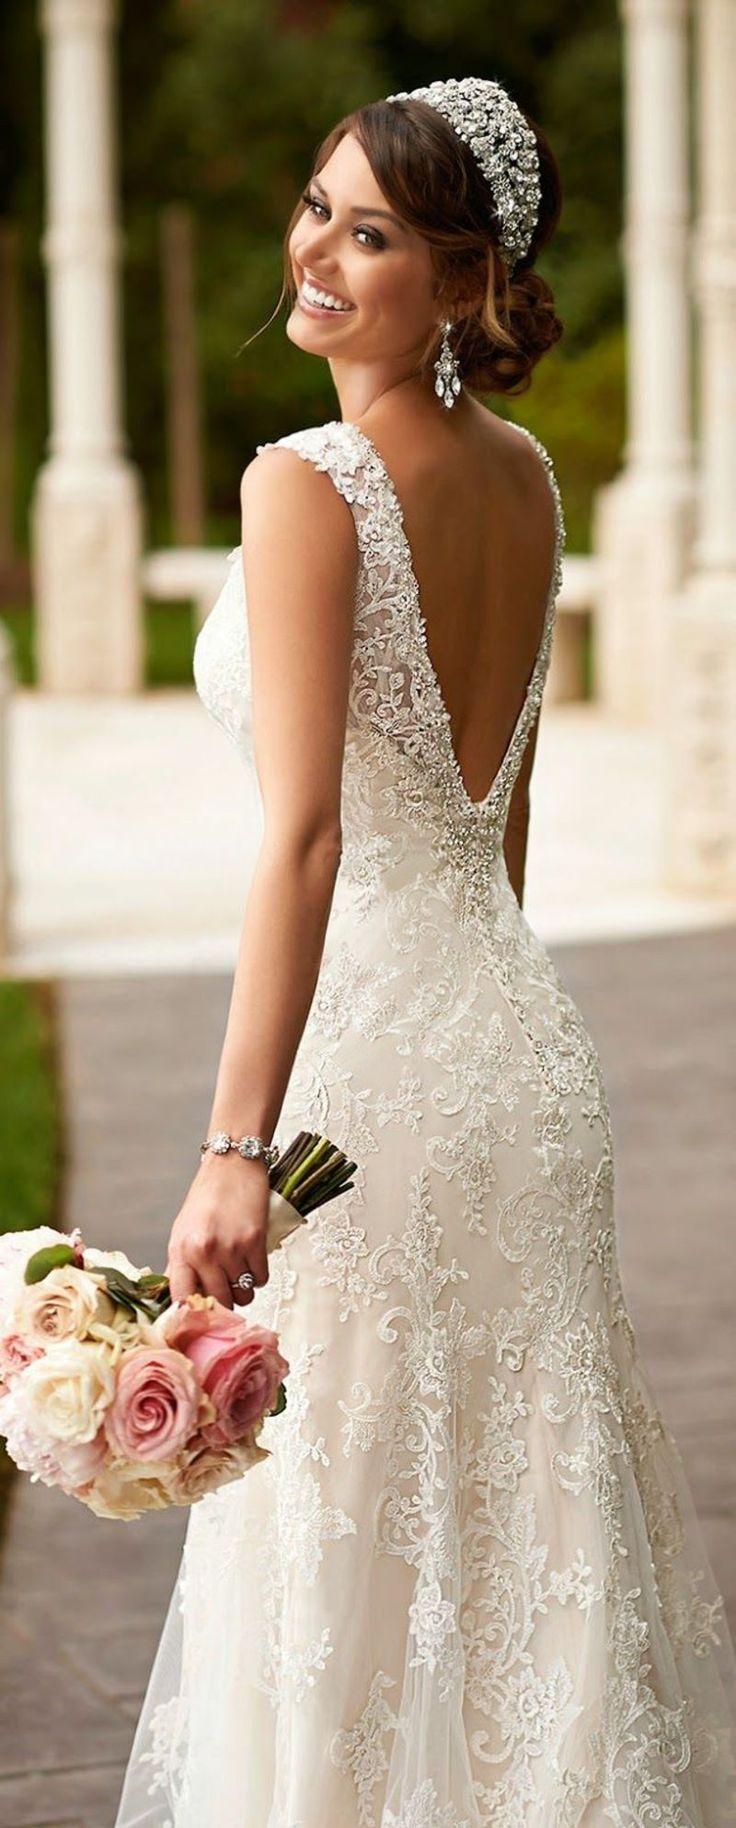 #Wedding Dress #Inspirations .. #weddingdresses